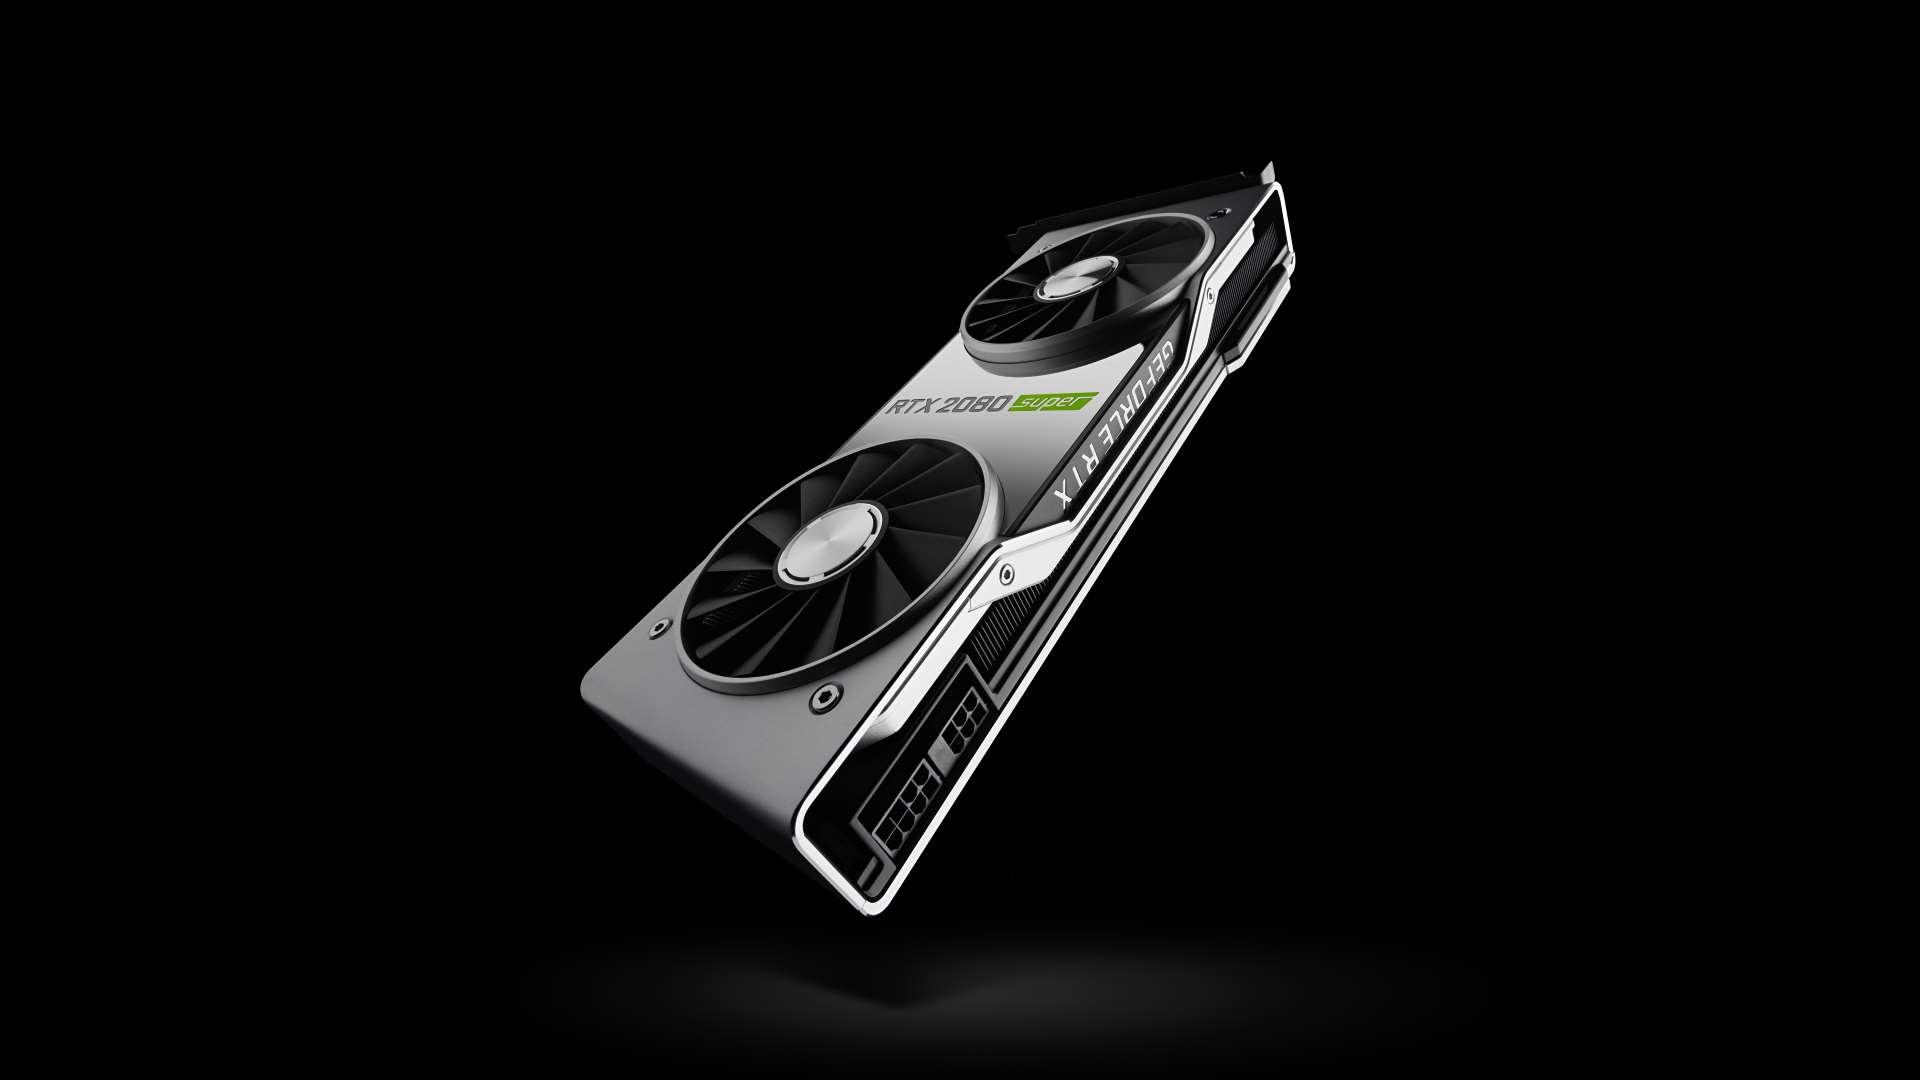 Nvidia RTX 2080 Super review: the 2070 Super has stolen its